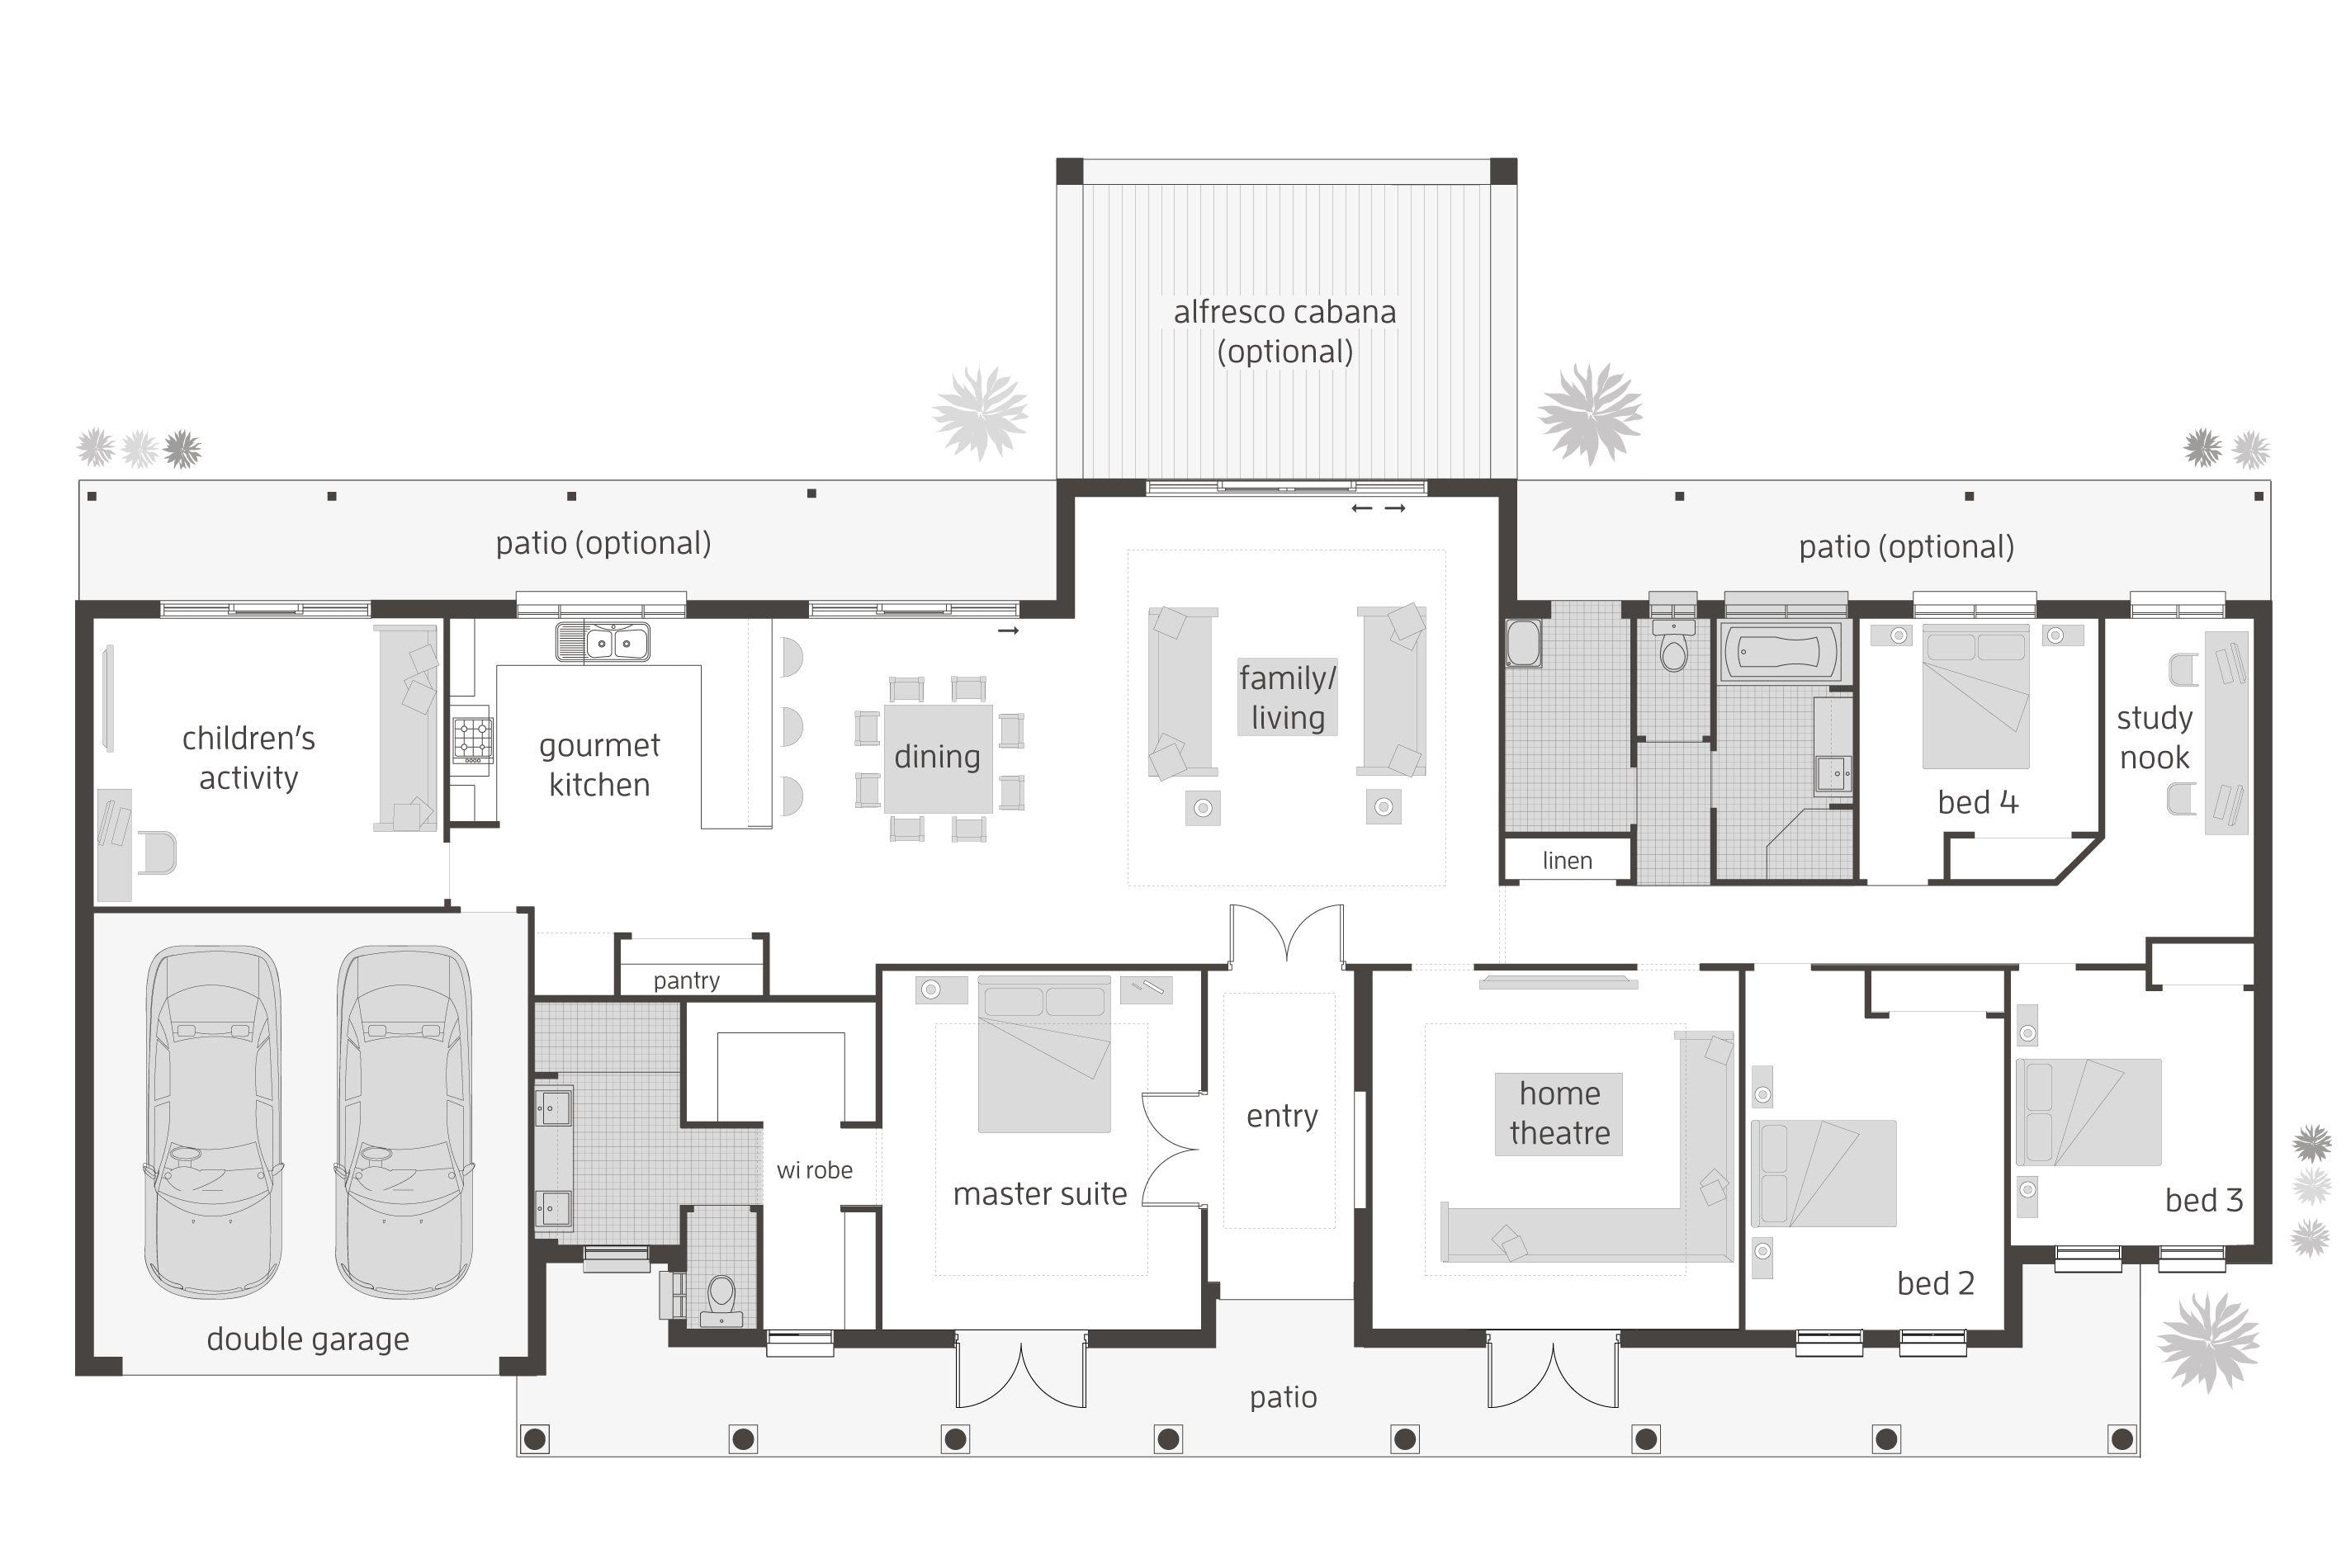 Open Plan House Designs For Acreage House Plans Intended For Typical Open Plan House Plans Australia Ideas House Plans Australia Open House Plans House Plans